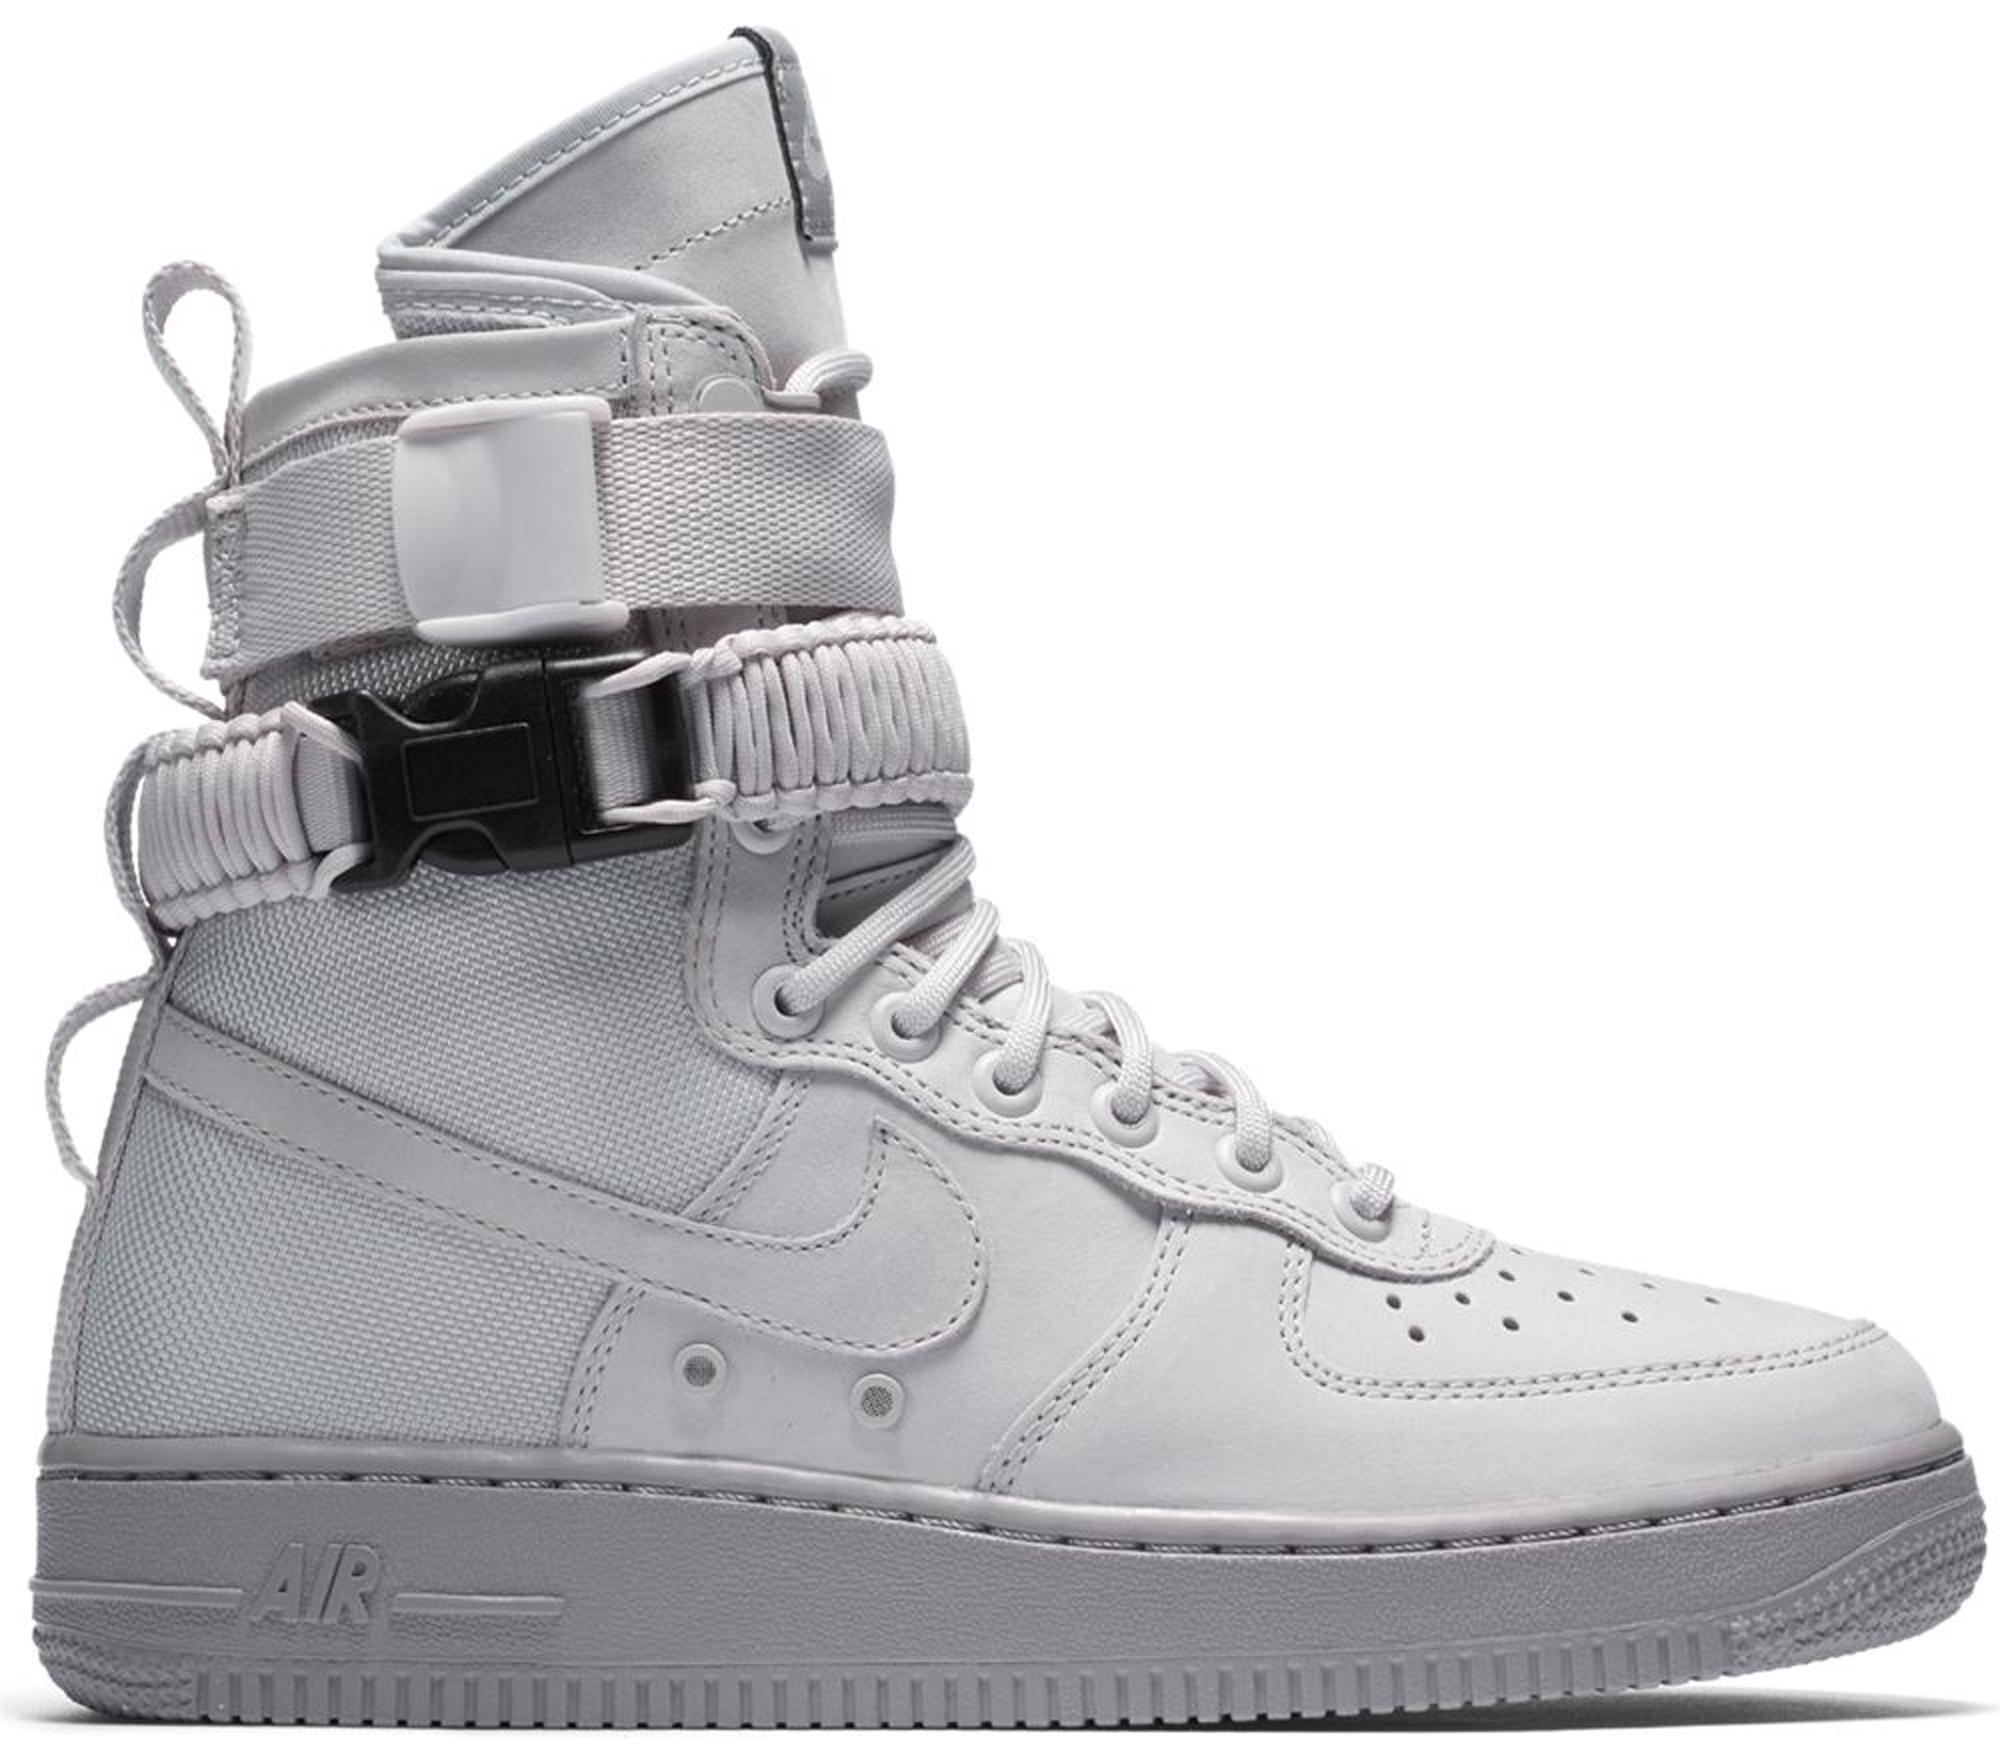 Nike SF Air Force 1 High Vast Grey (W